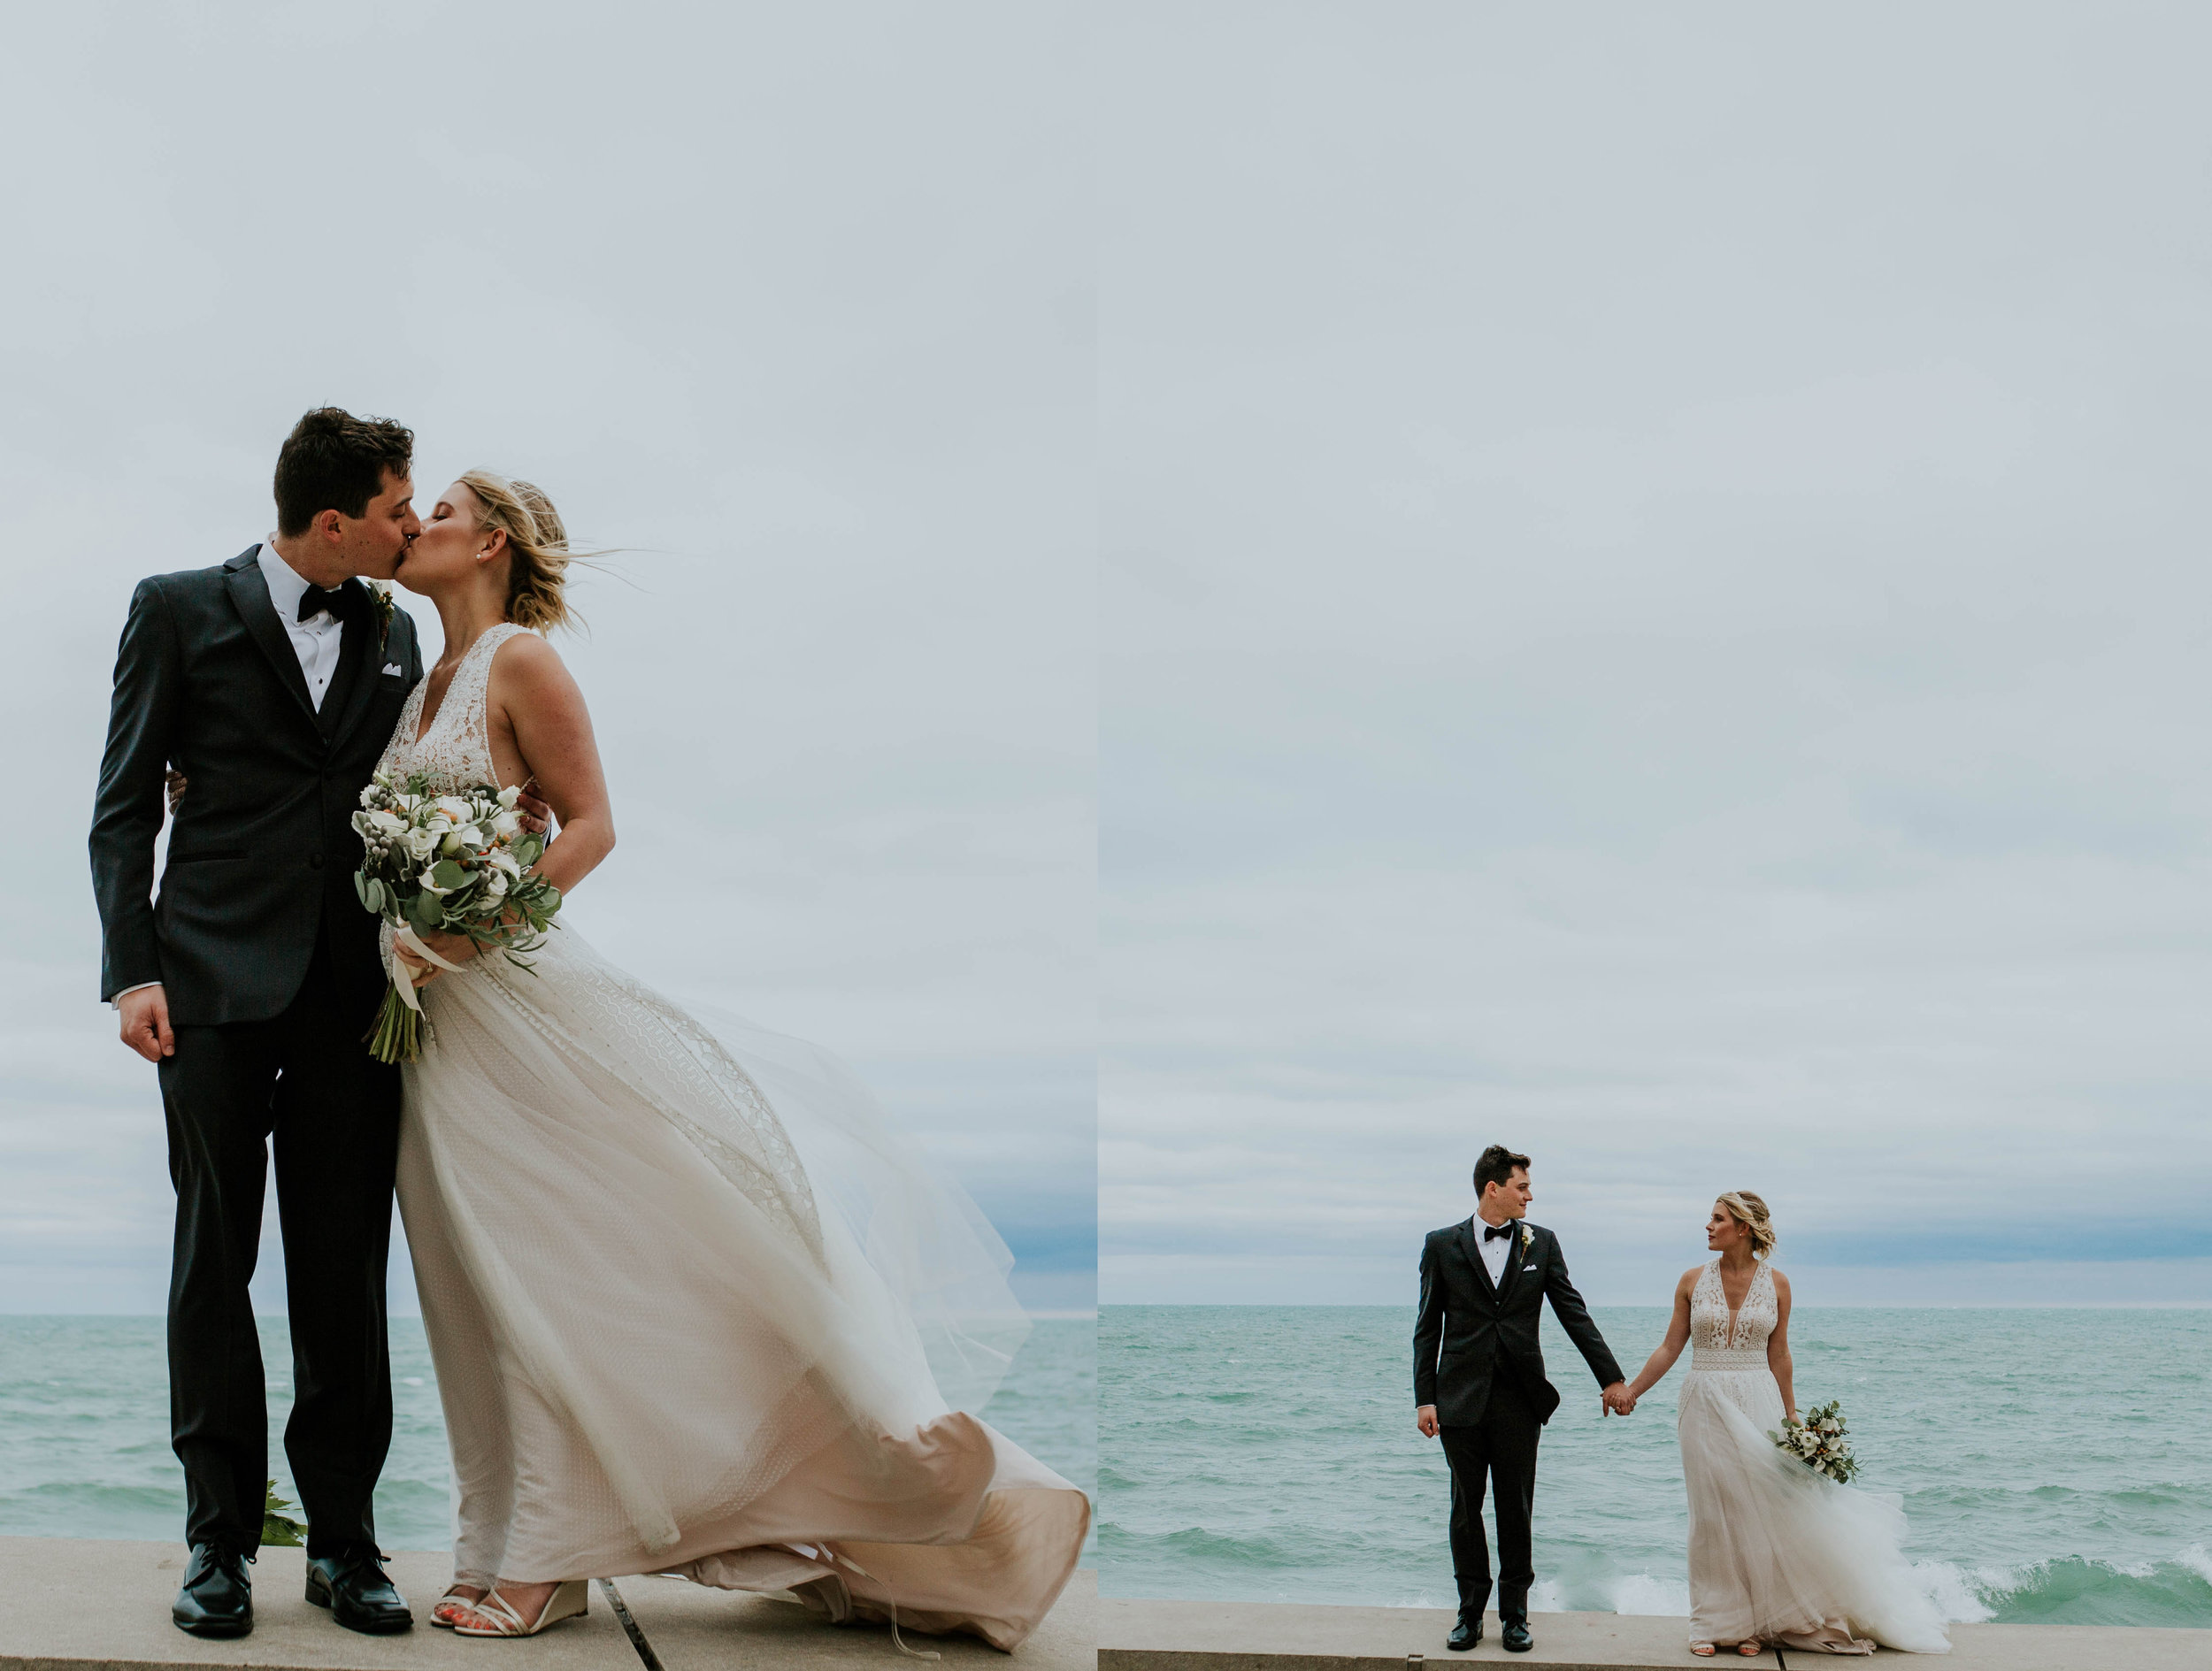 Jenero Wedding 100618-519 copy.jpg